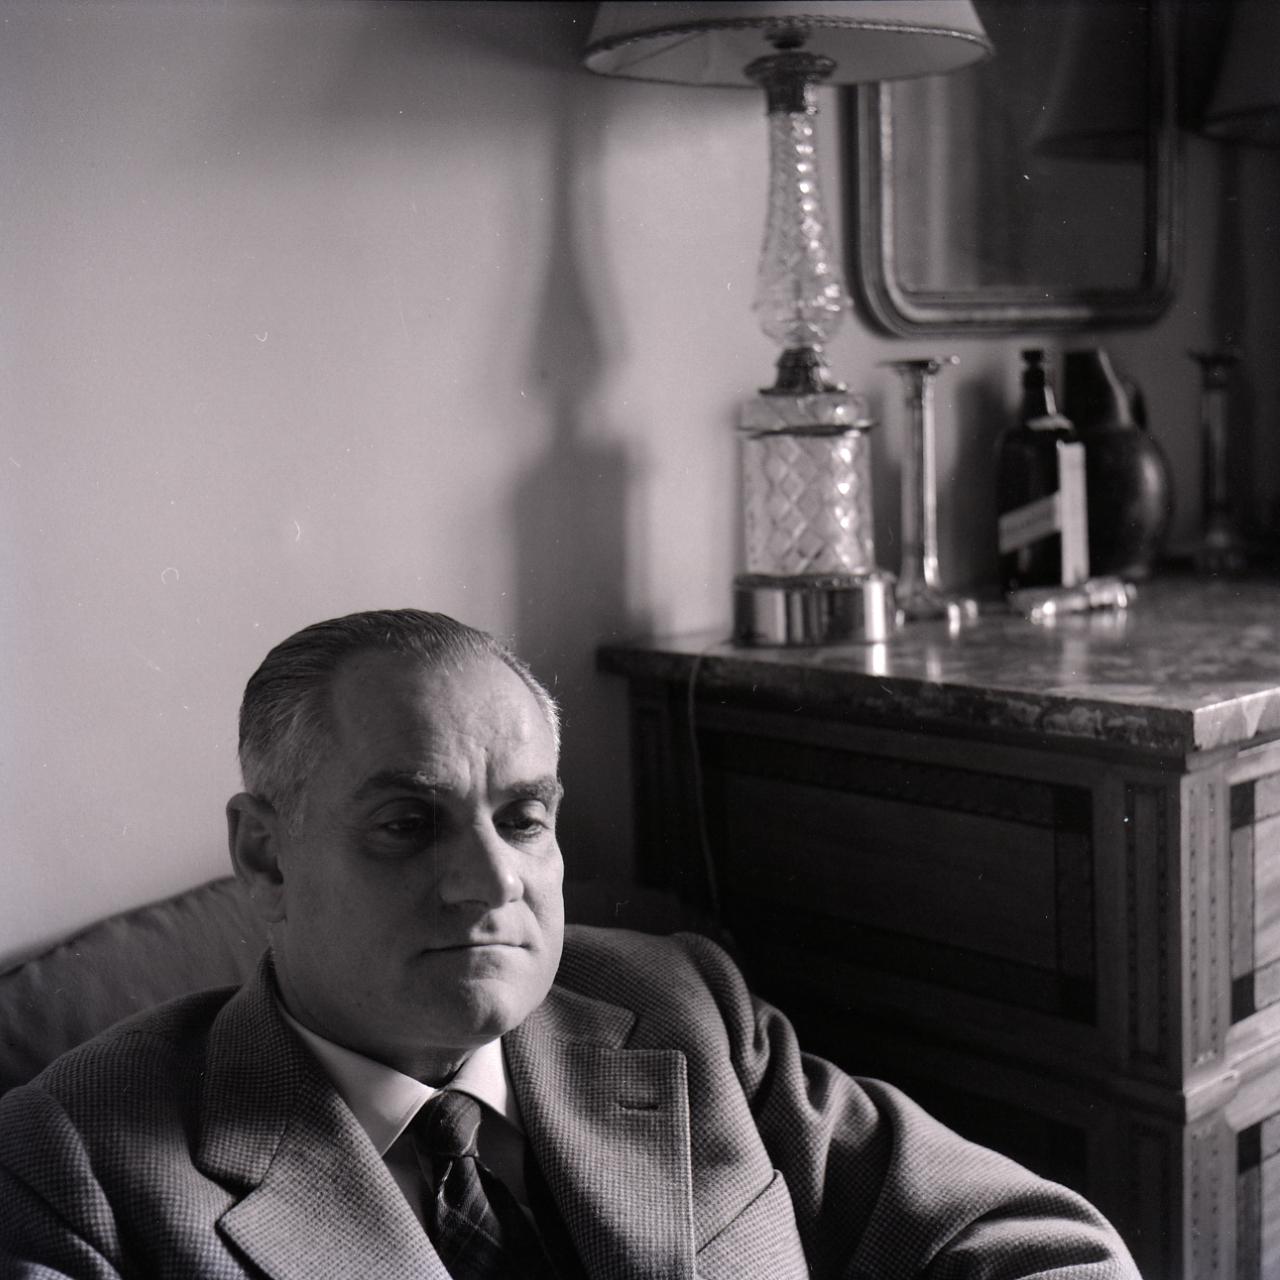 Photo Alberto Moravia via Opendata BNF